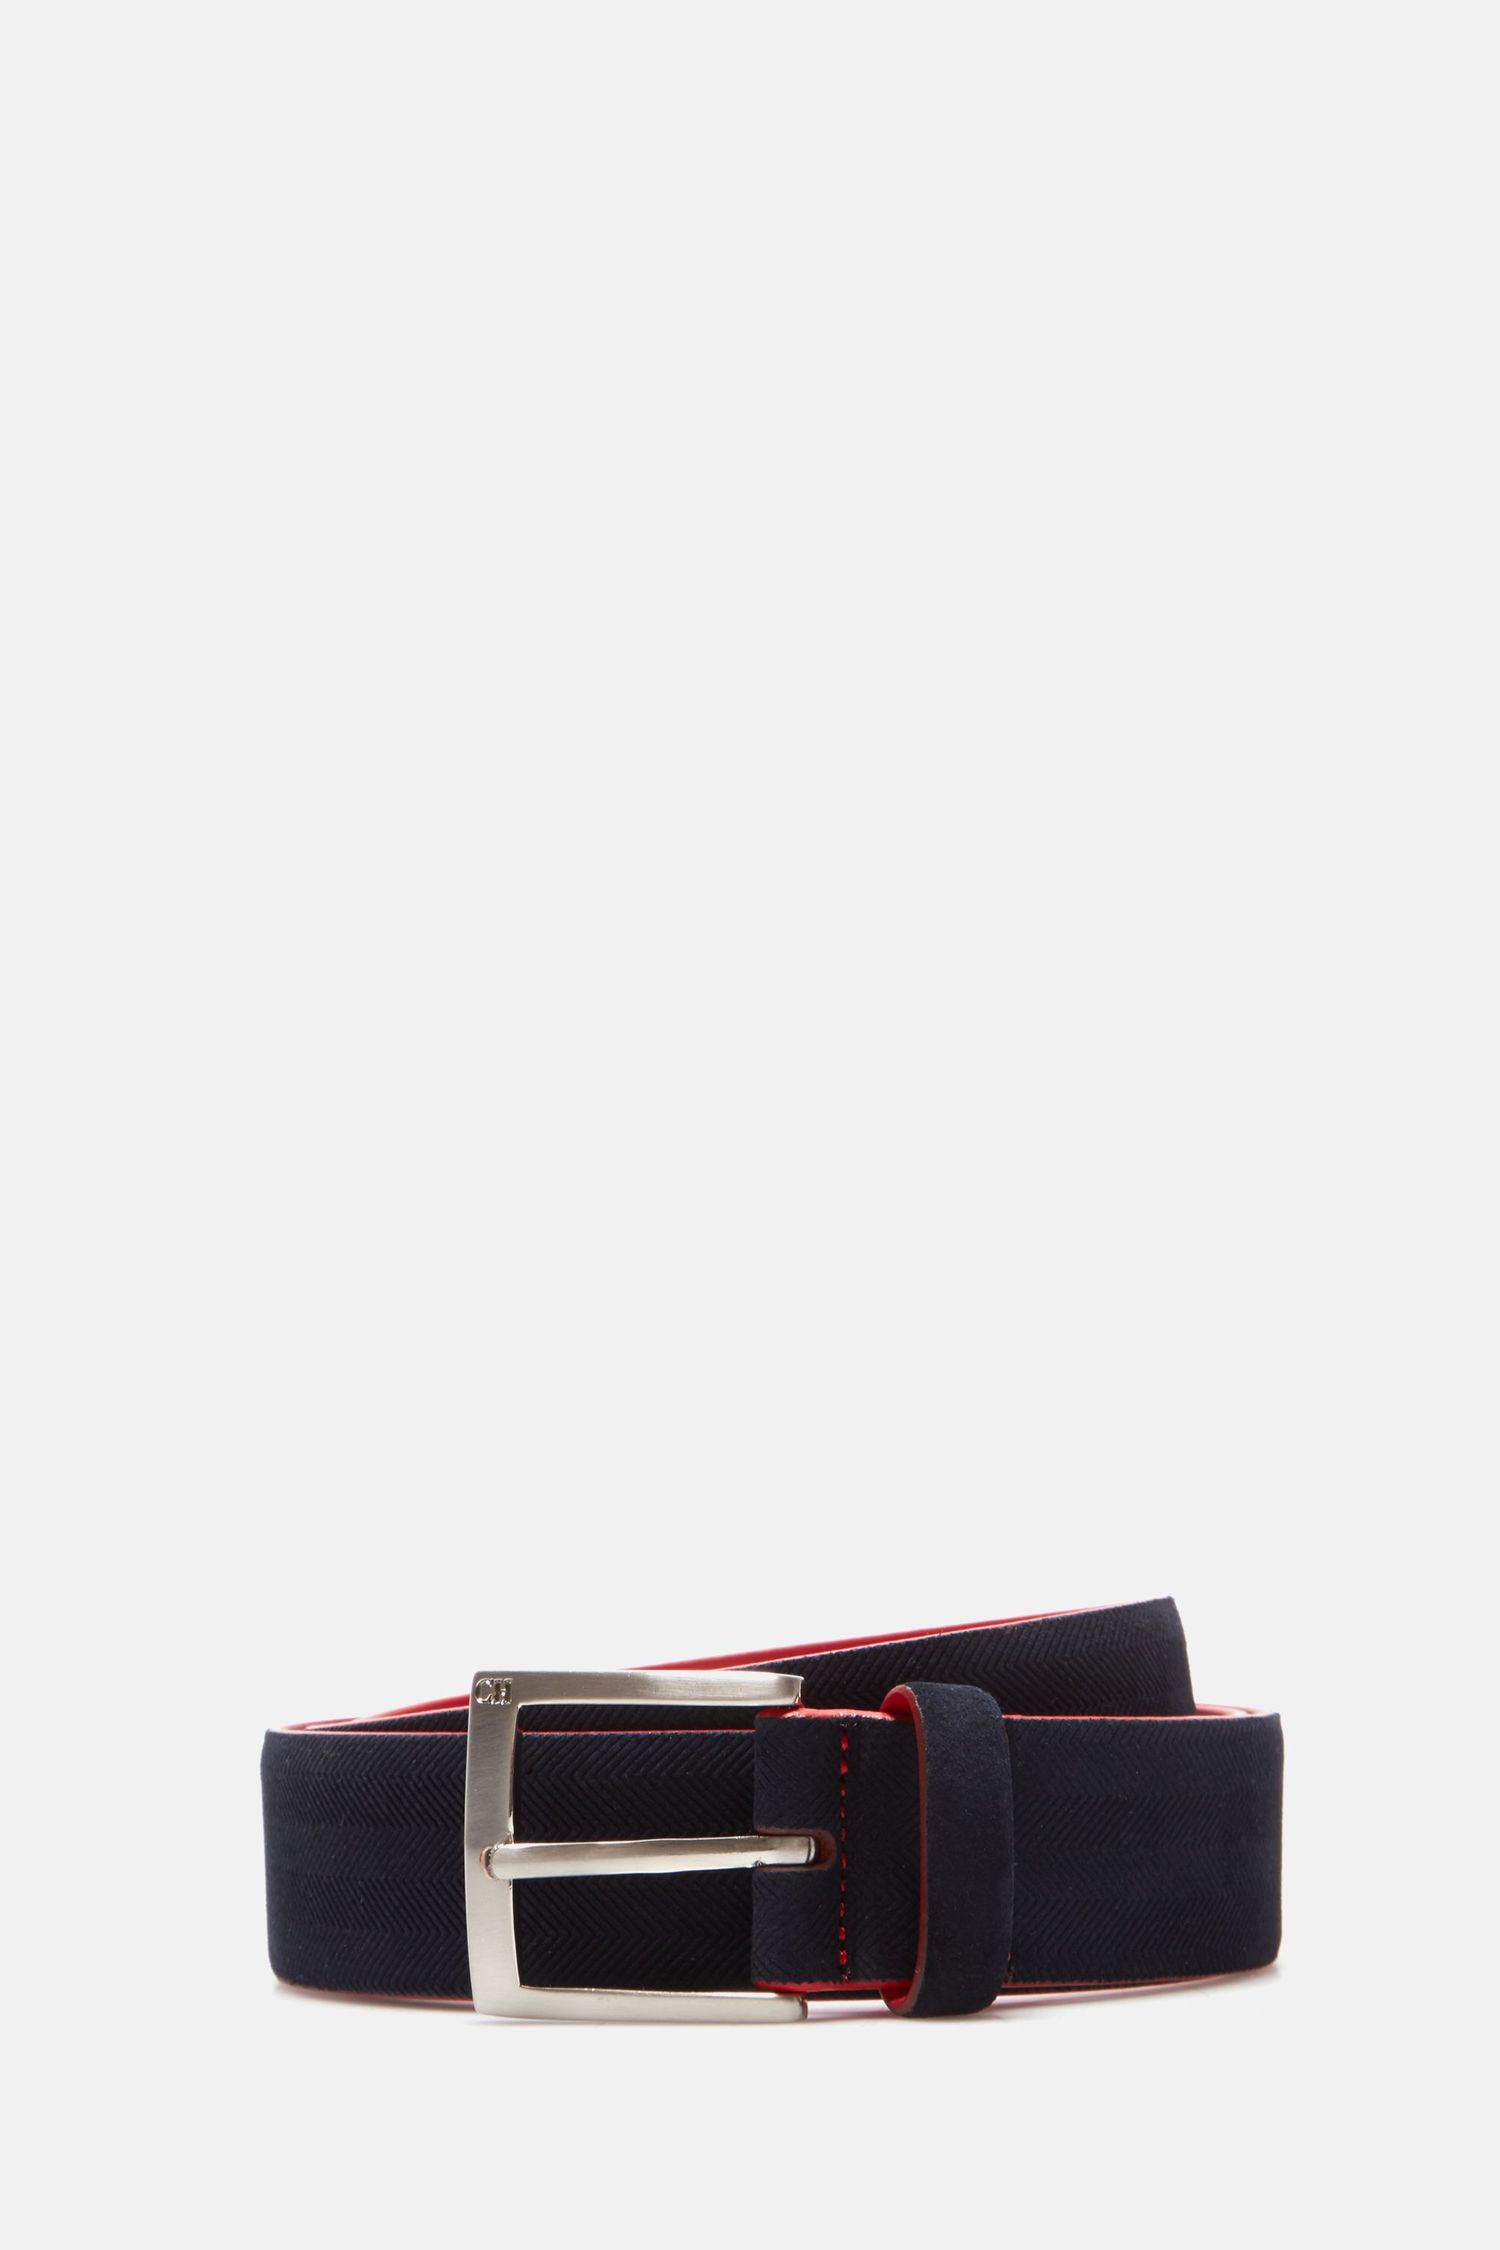 Embossed suede belt